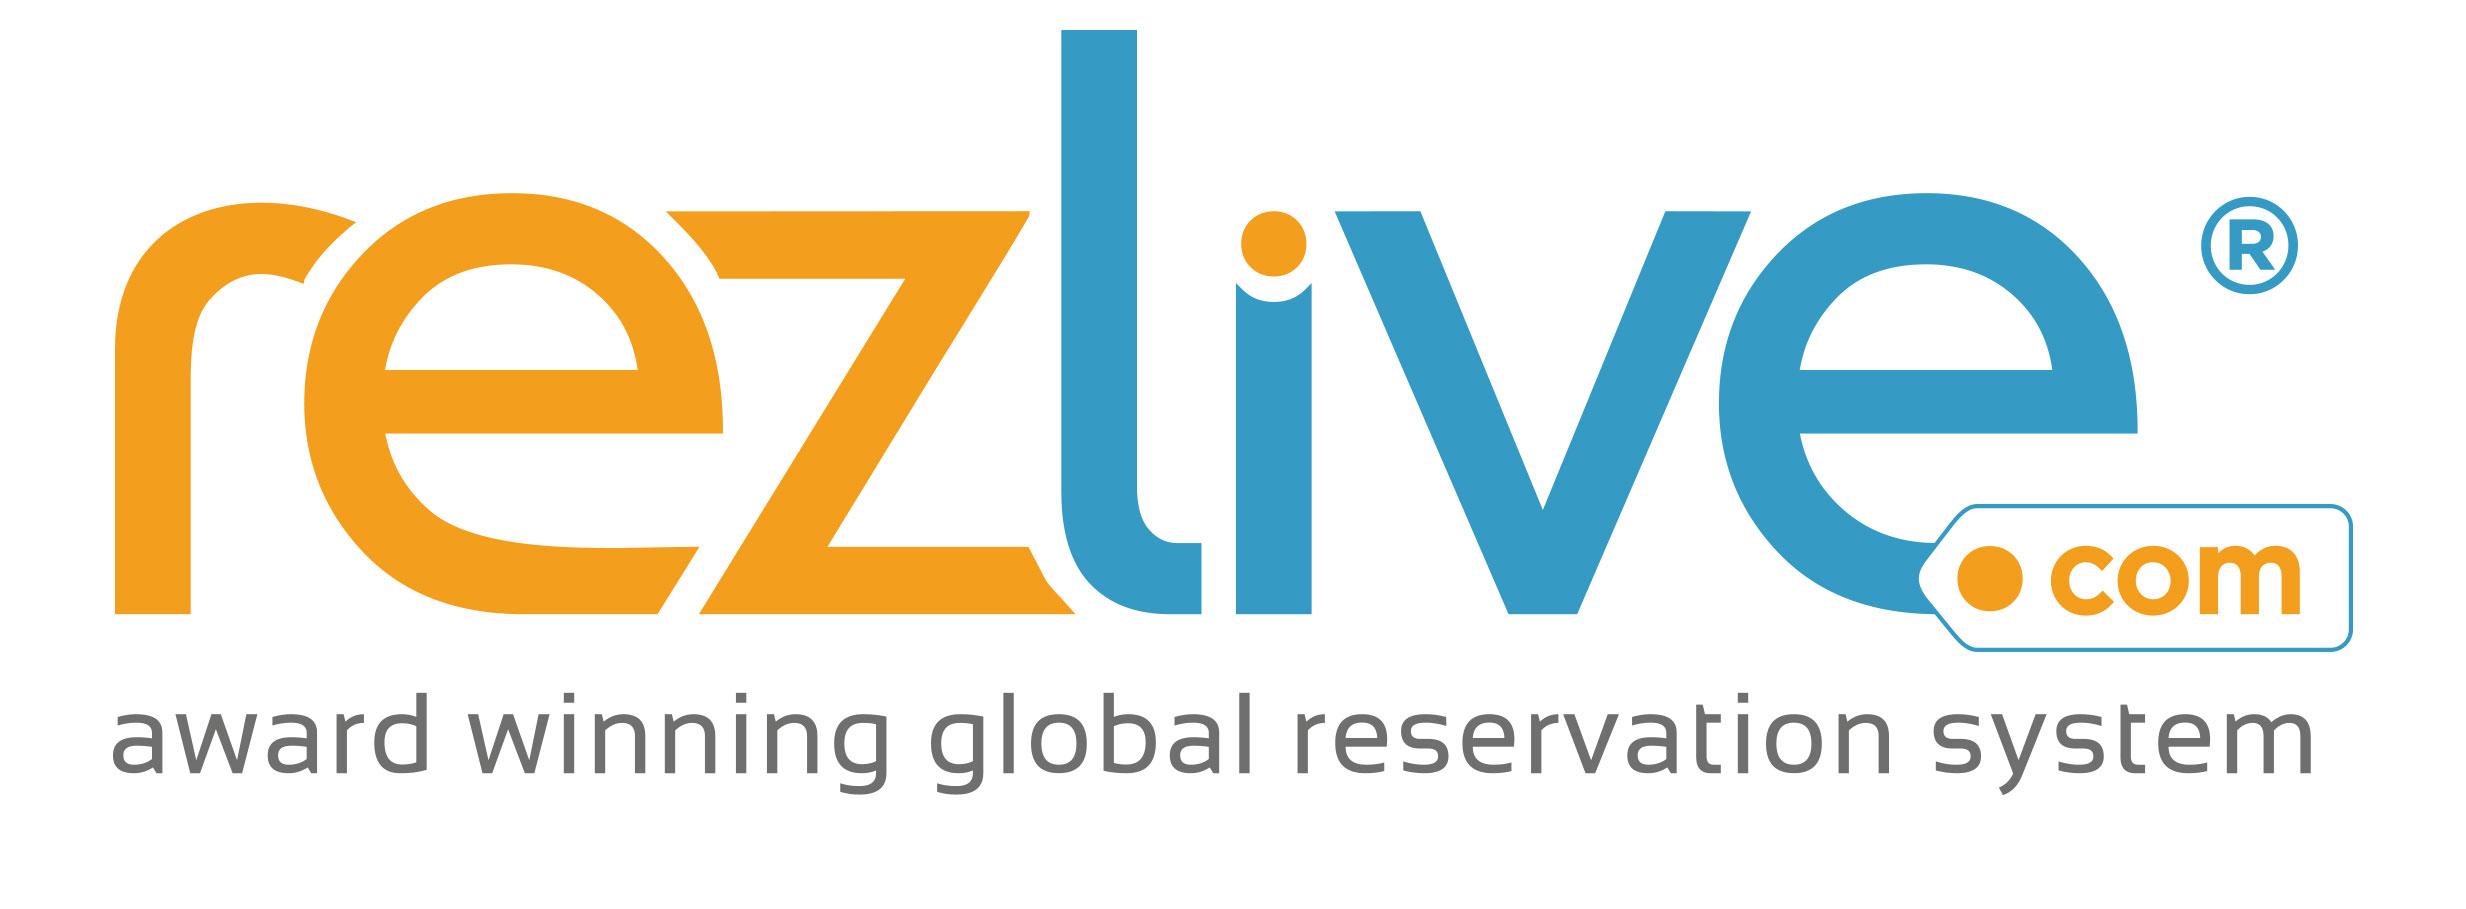 Rezlive com is now a SuperbrandRezlive com is now a